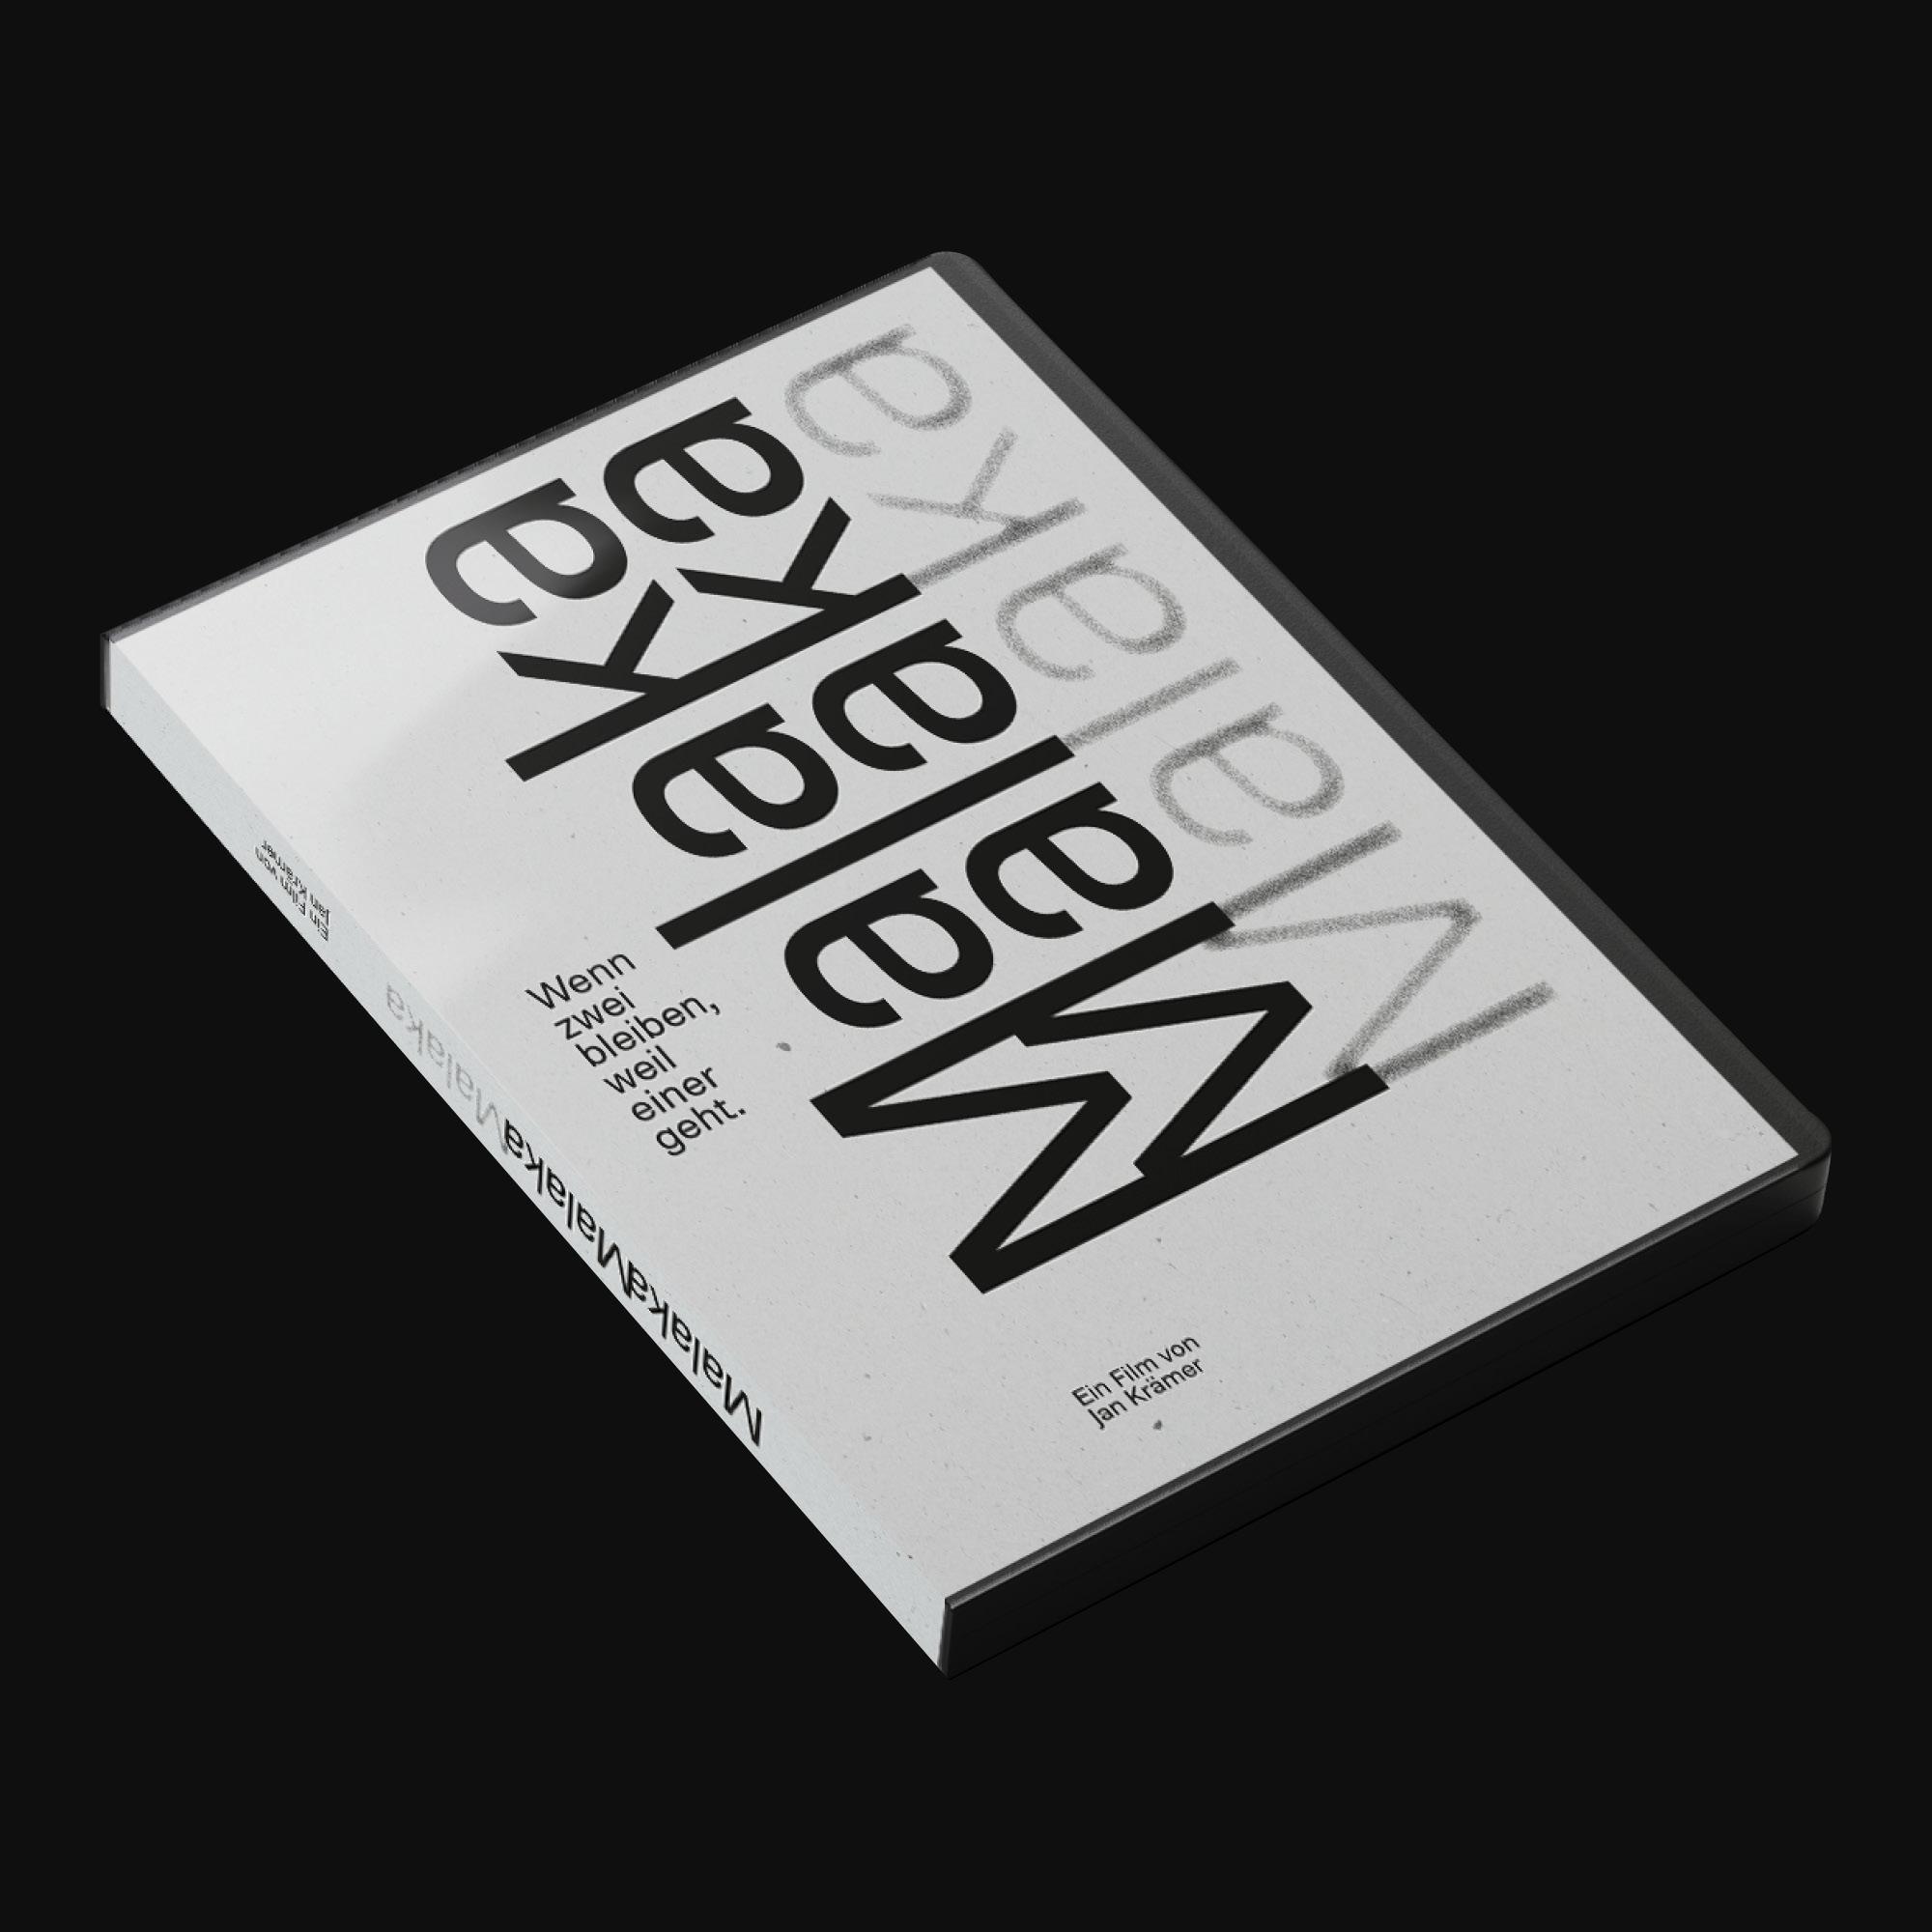 DVD-Cover für Malaka — Corporate Design Studio Köln